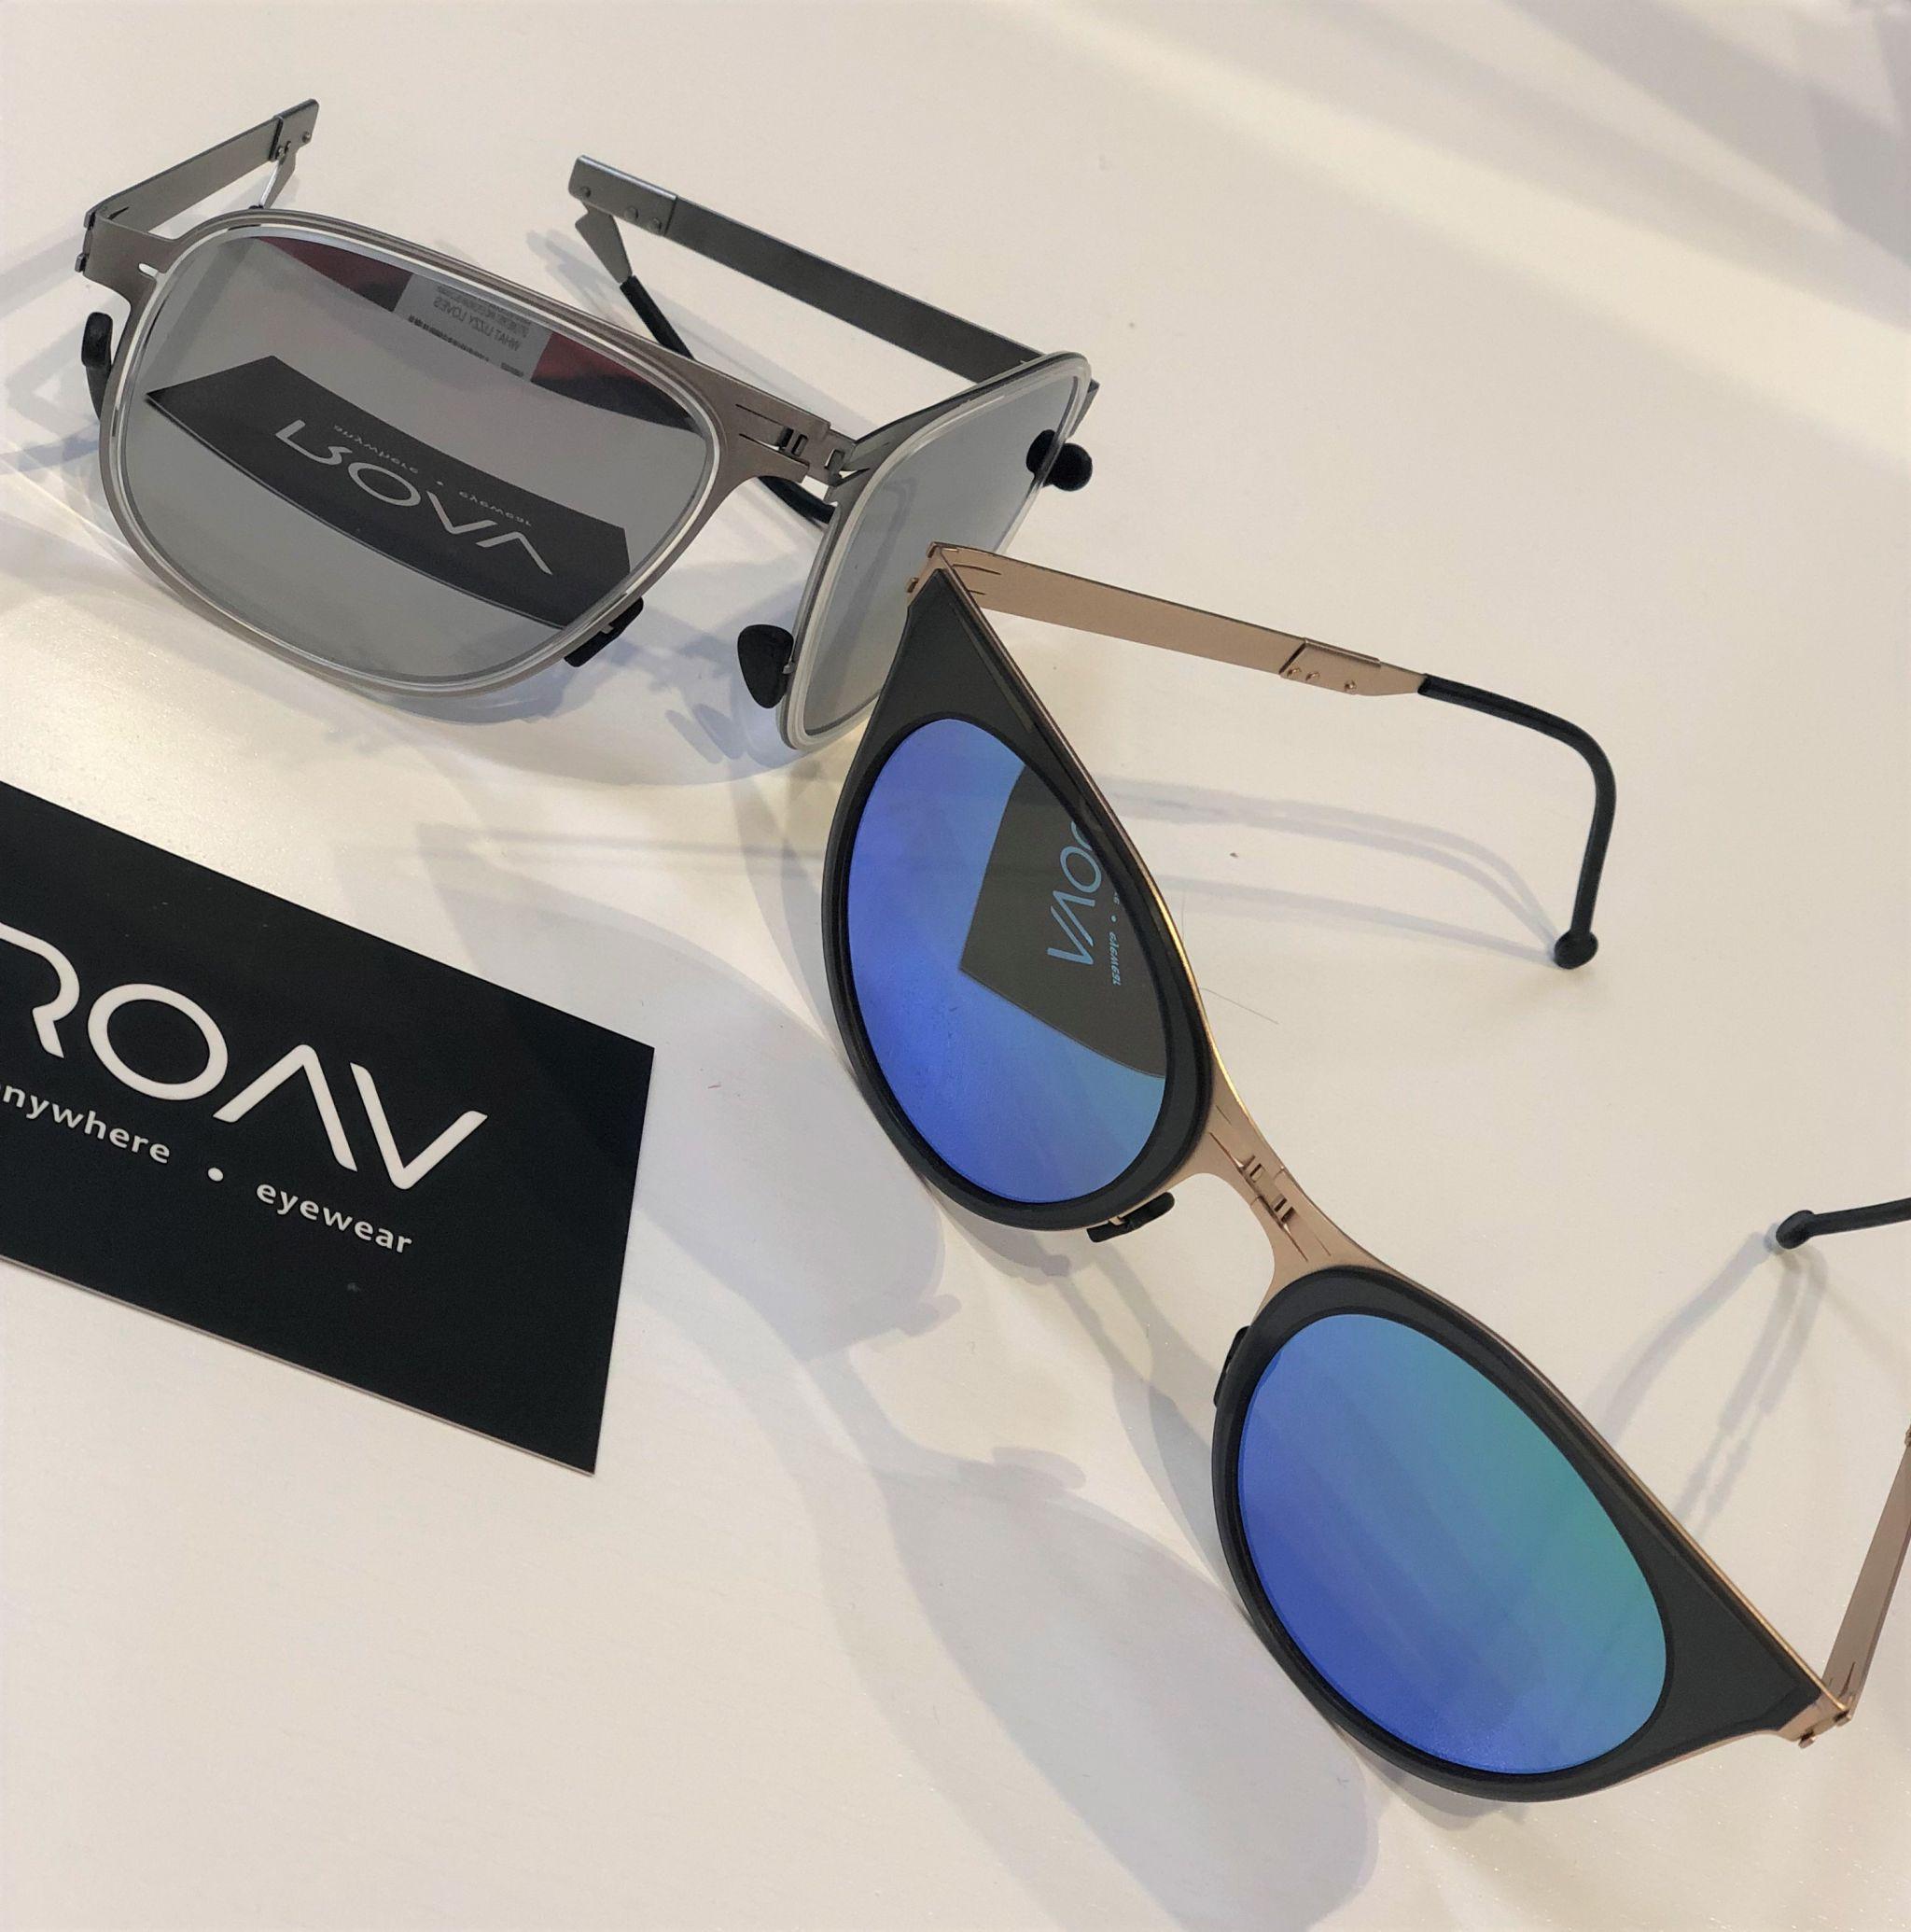 Optrafair 2019 Bondeye Optical ROAV